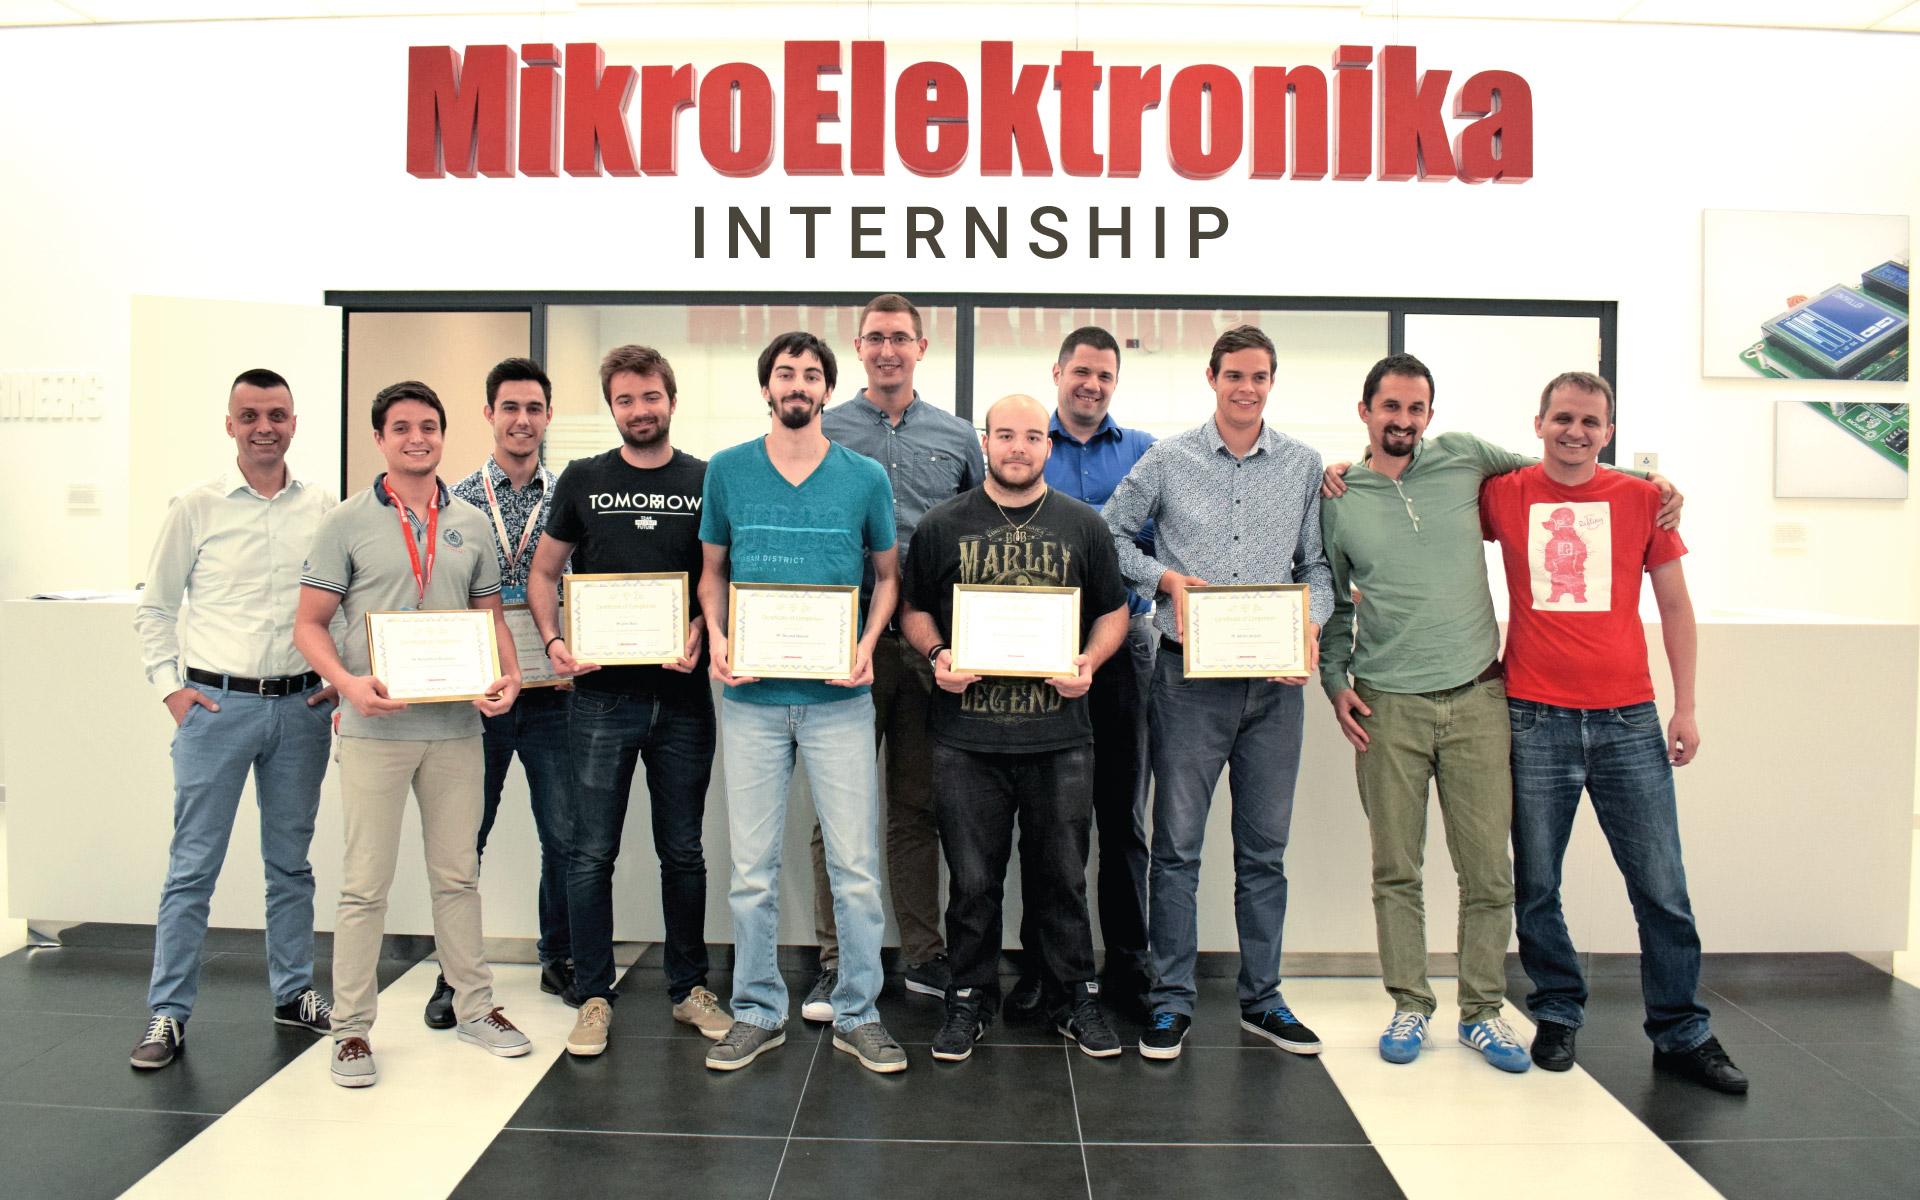 What happens at the end of a summer internship at MikroElektronika?